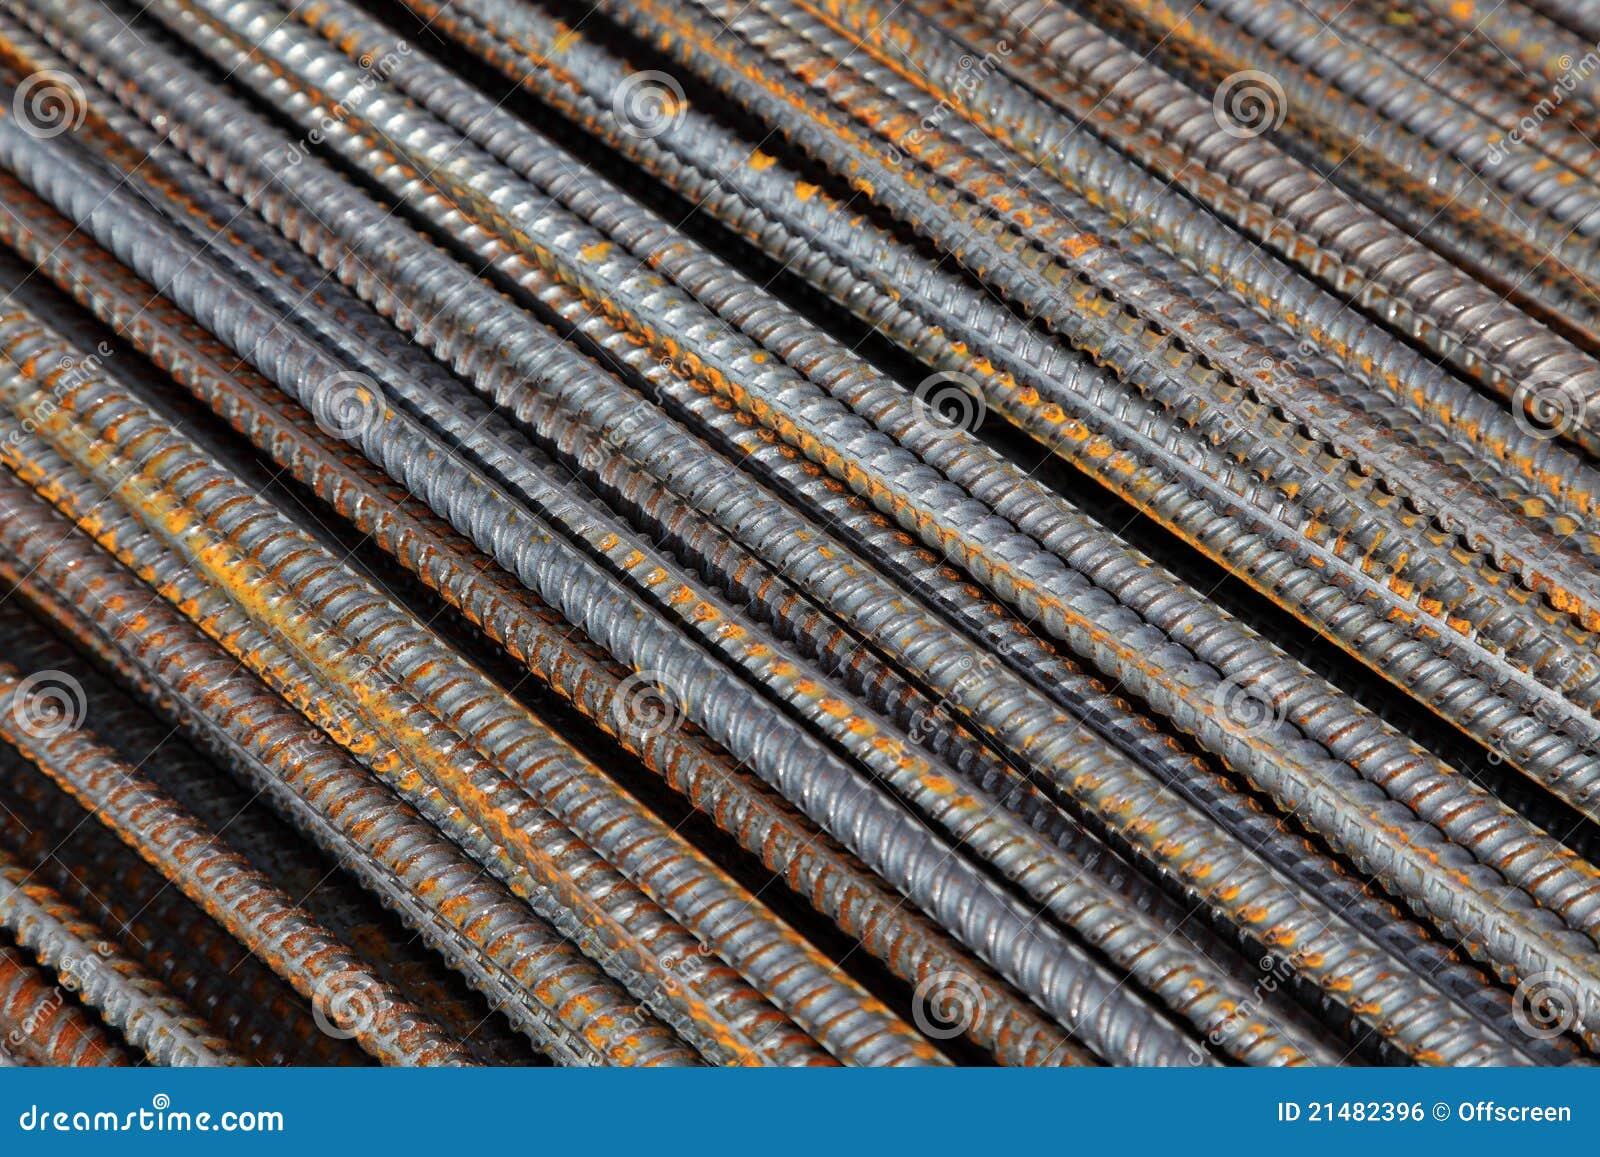 Steel Reinforcement Bars : Reinforcement bar royalty free stock image